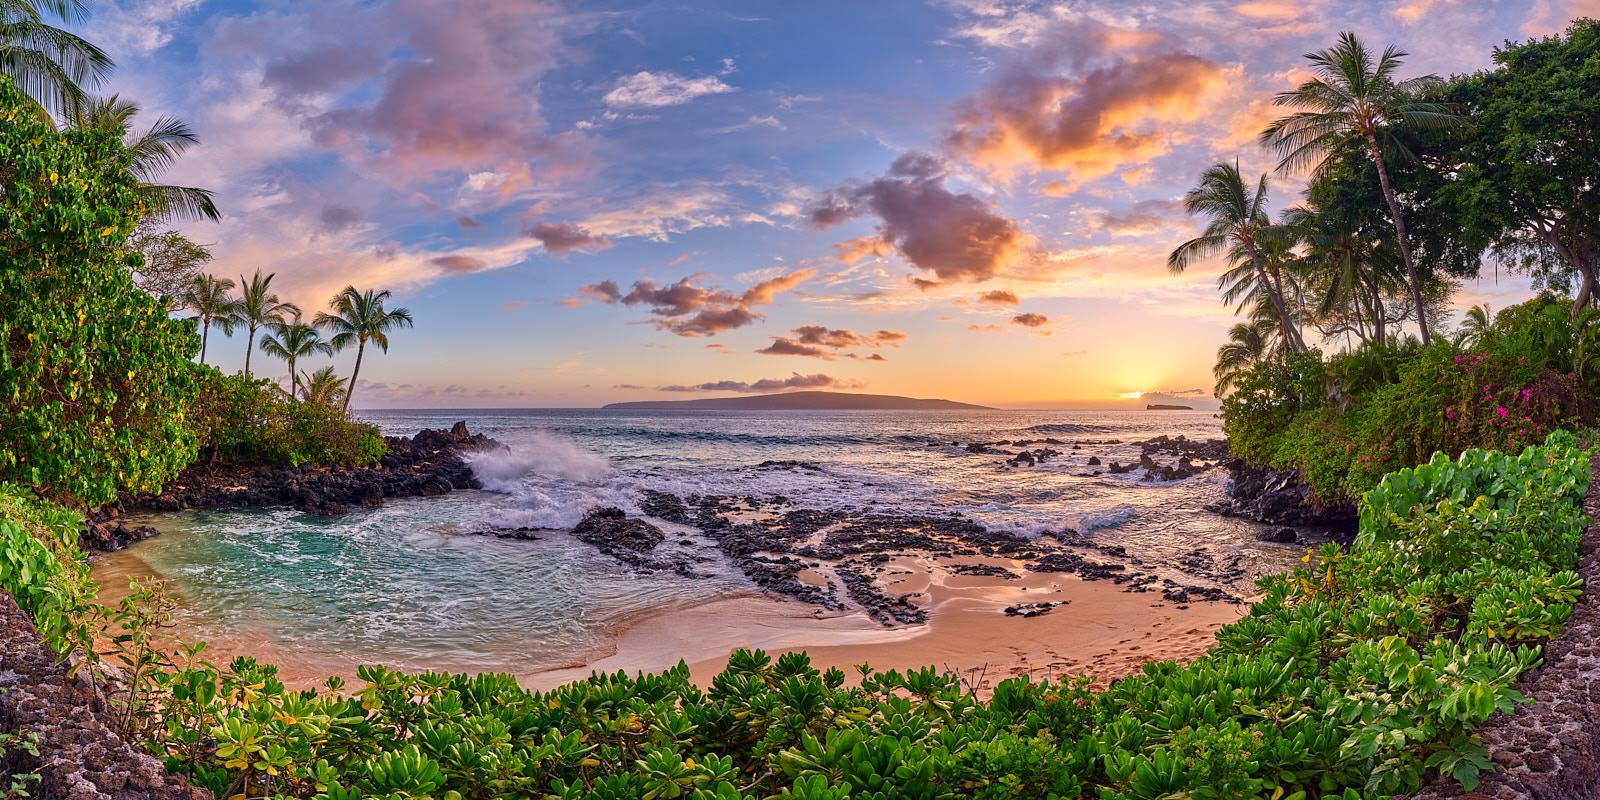 panorama, secret beach, sunset, orange, blue, makena, secret cove, secret, wedding beach, photo